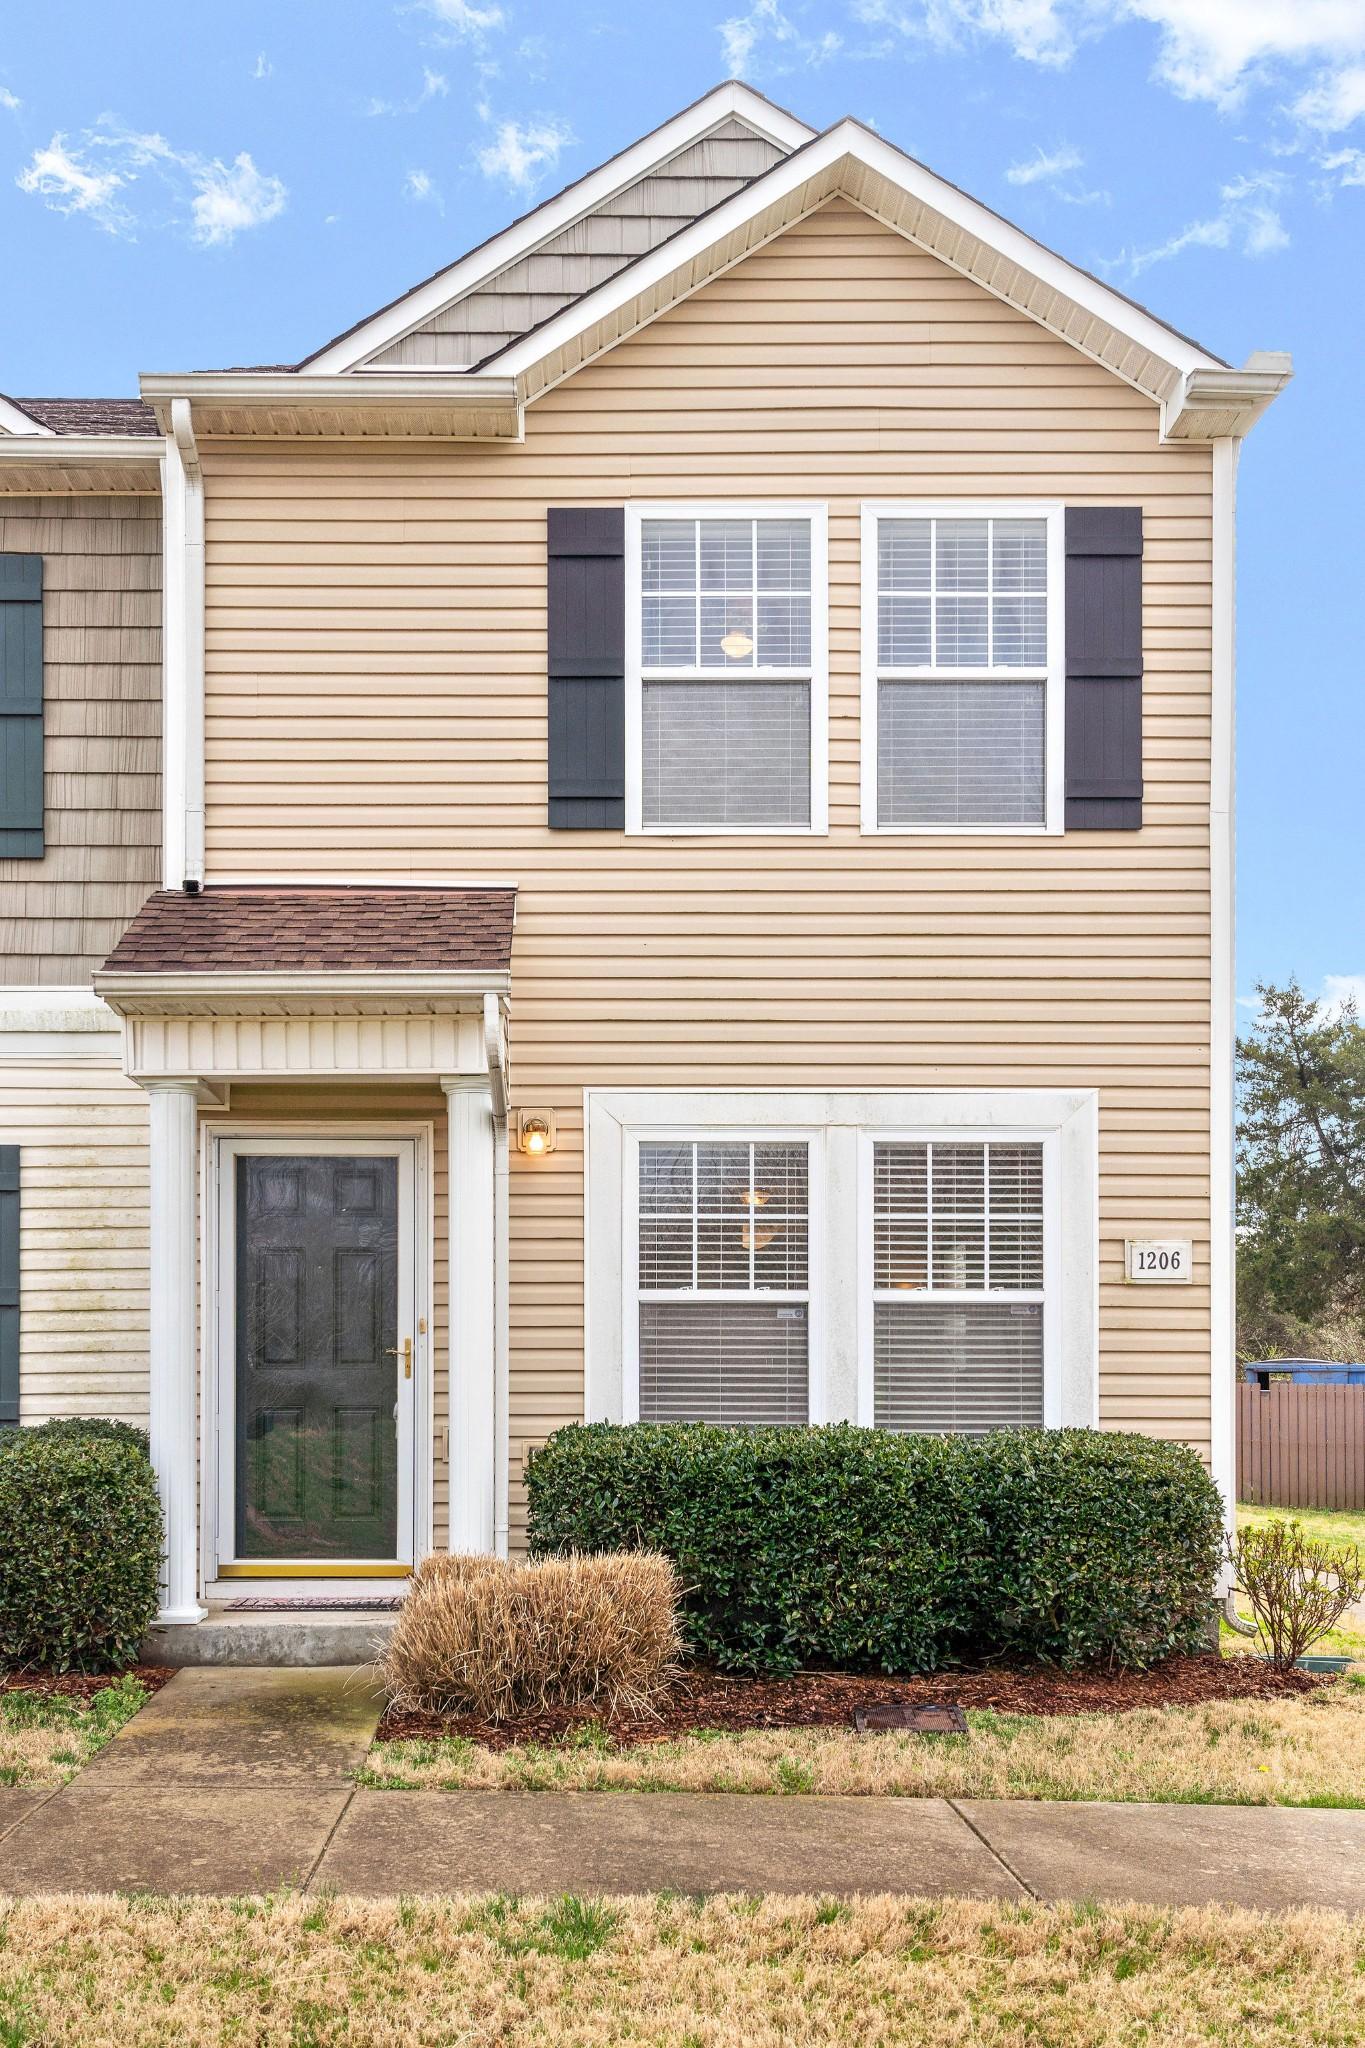 1206 Parkstone Ln Property Photo - Antioch, TN real estate listing